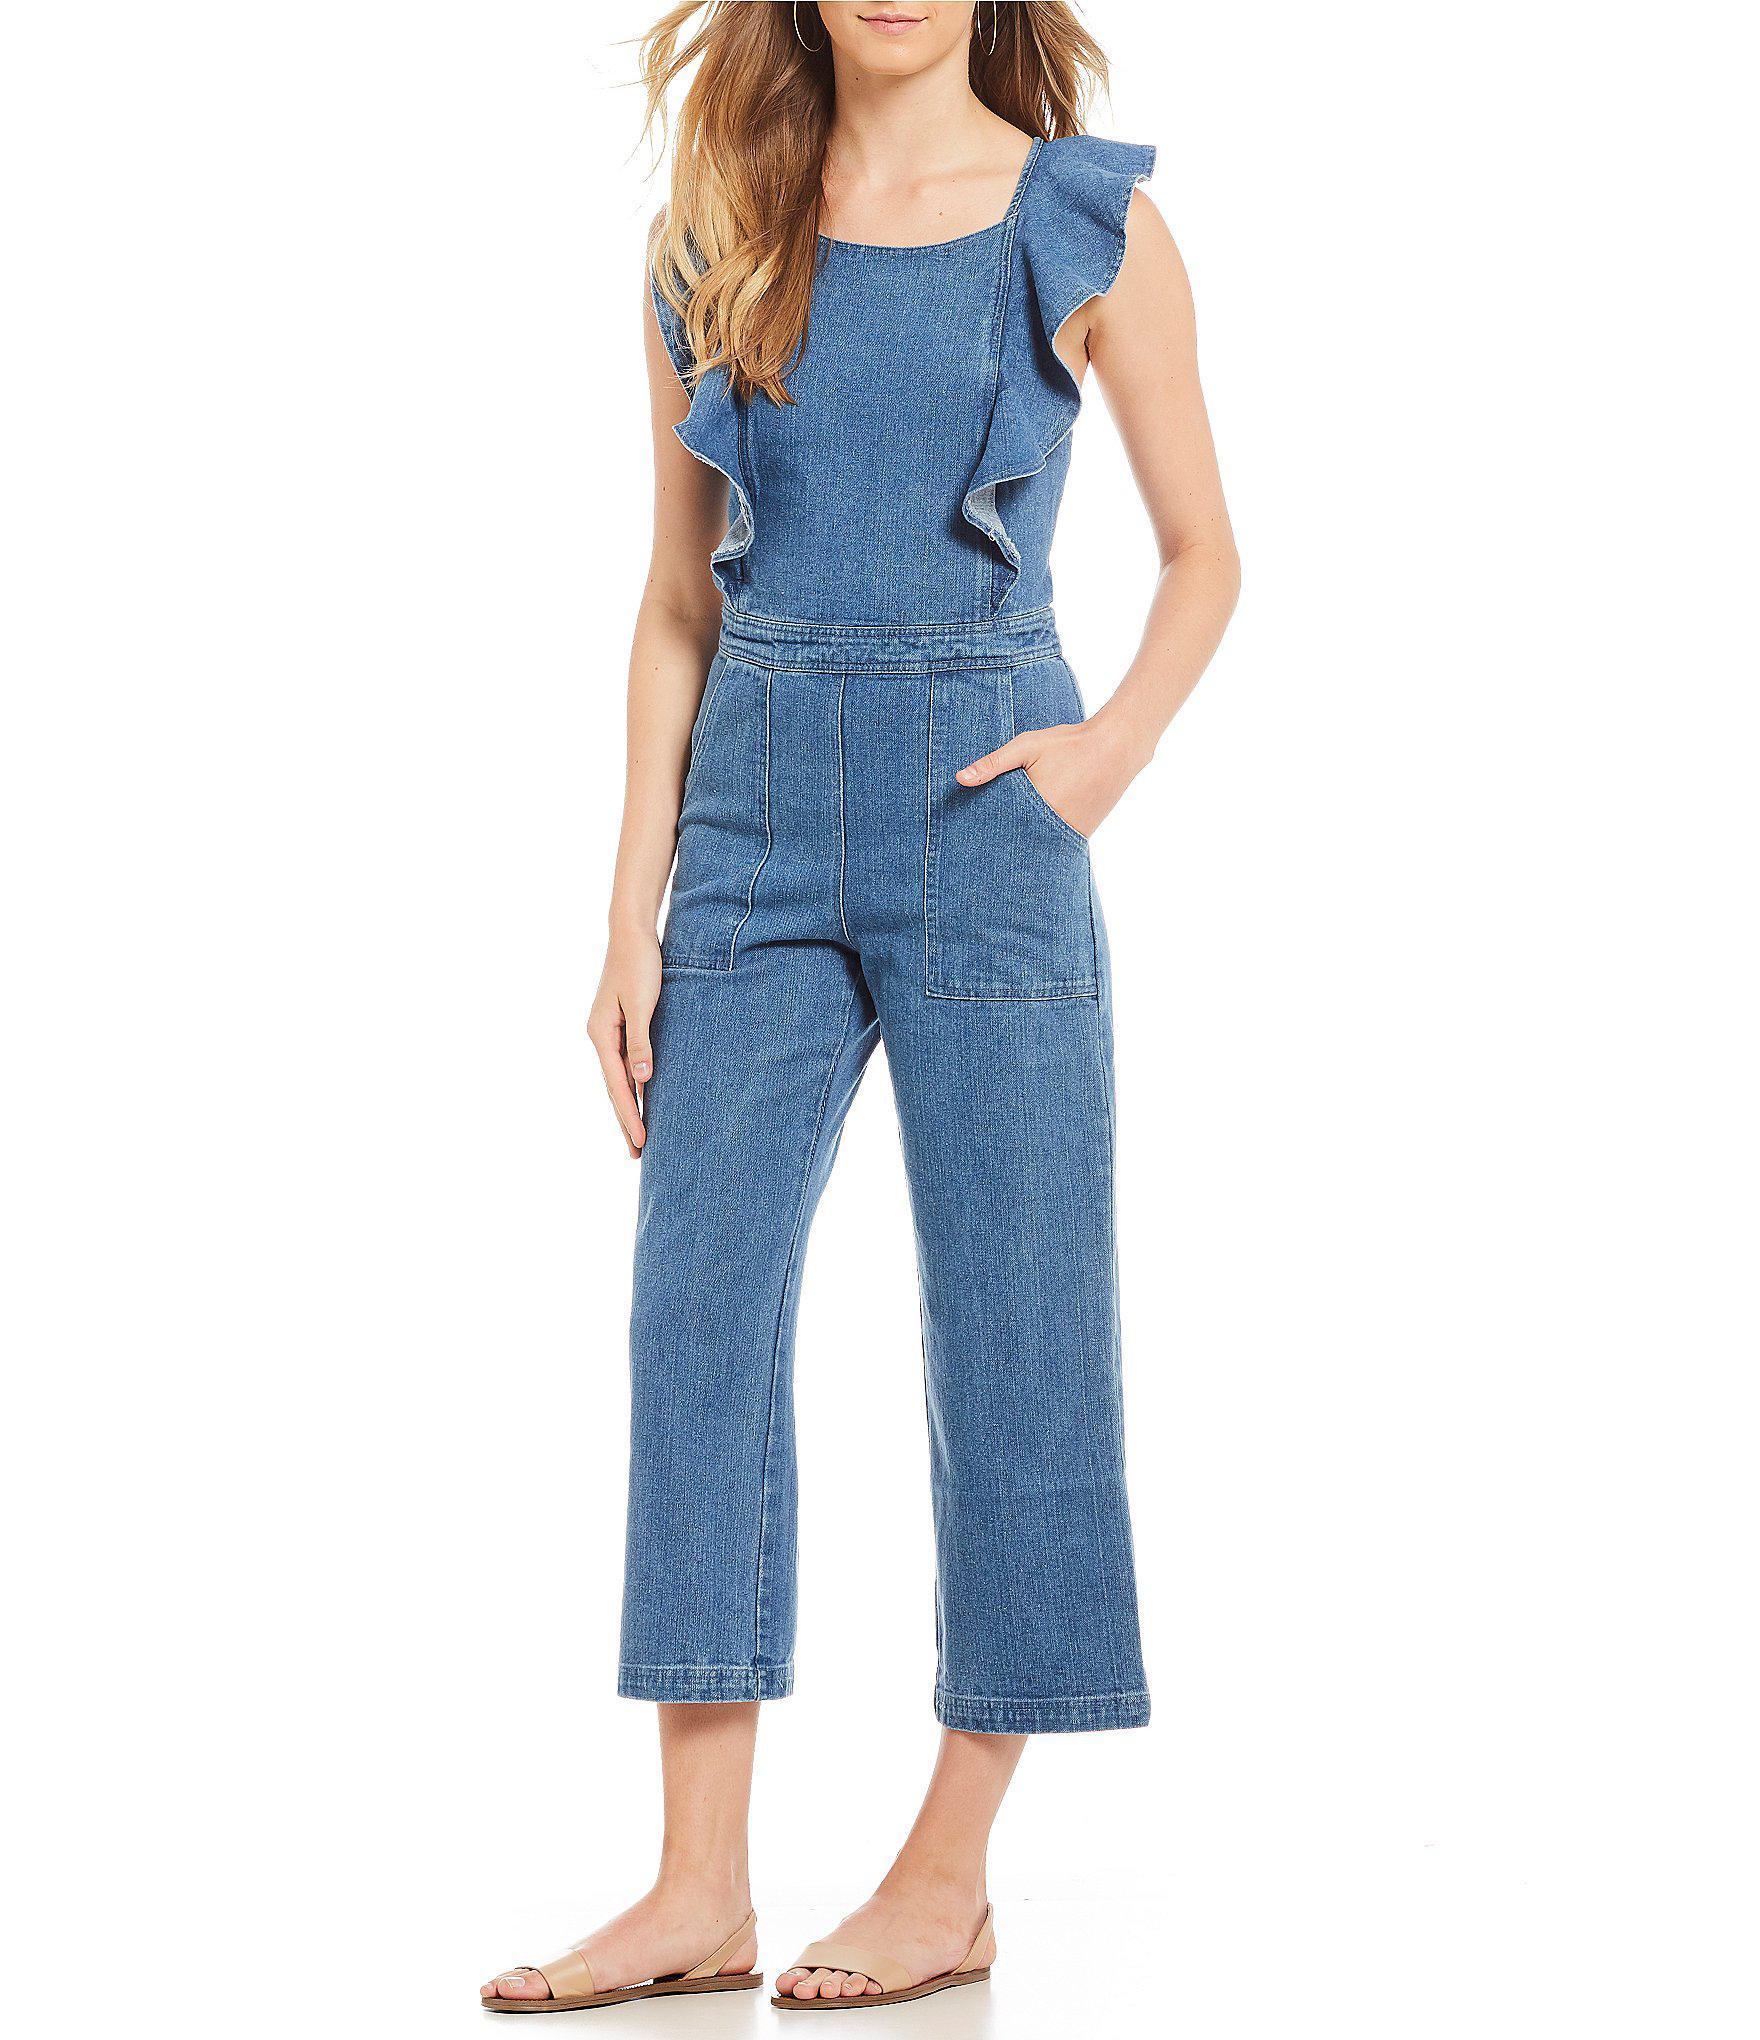 76658aee5b9 Lyst - Sugarlips Denim Open Back Ruffle Jumpsuit in Blue